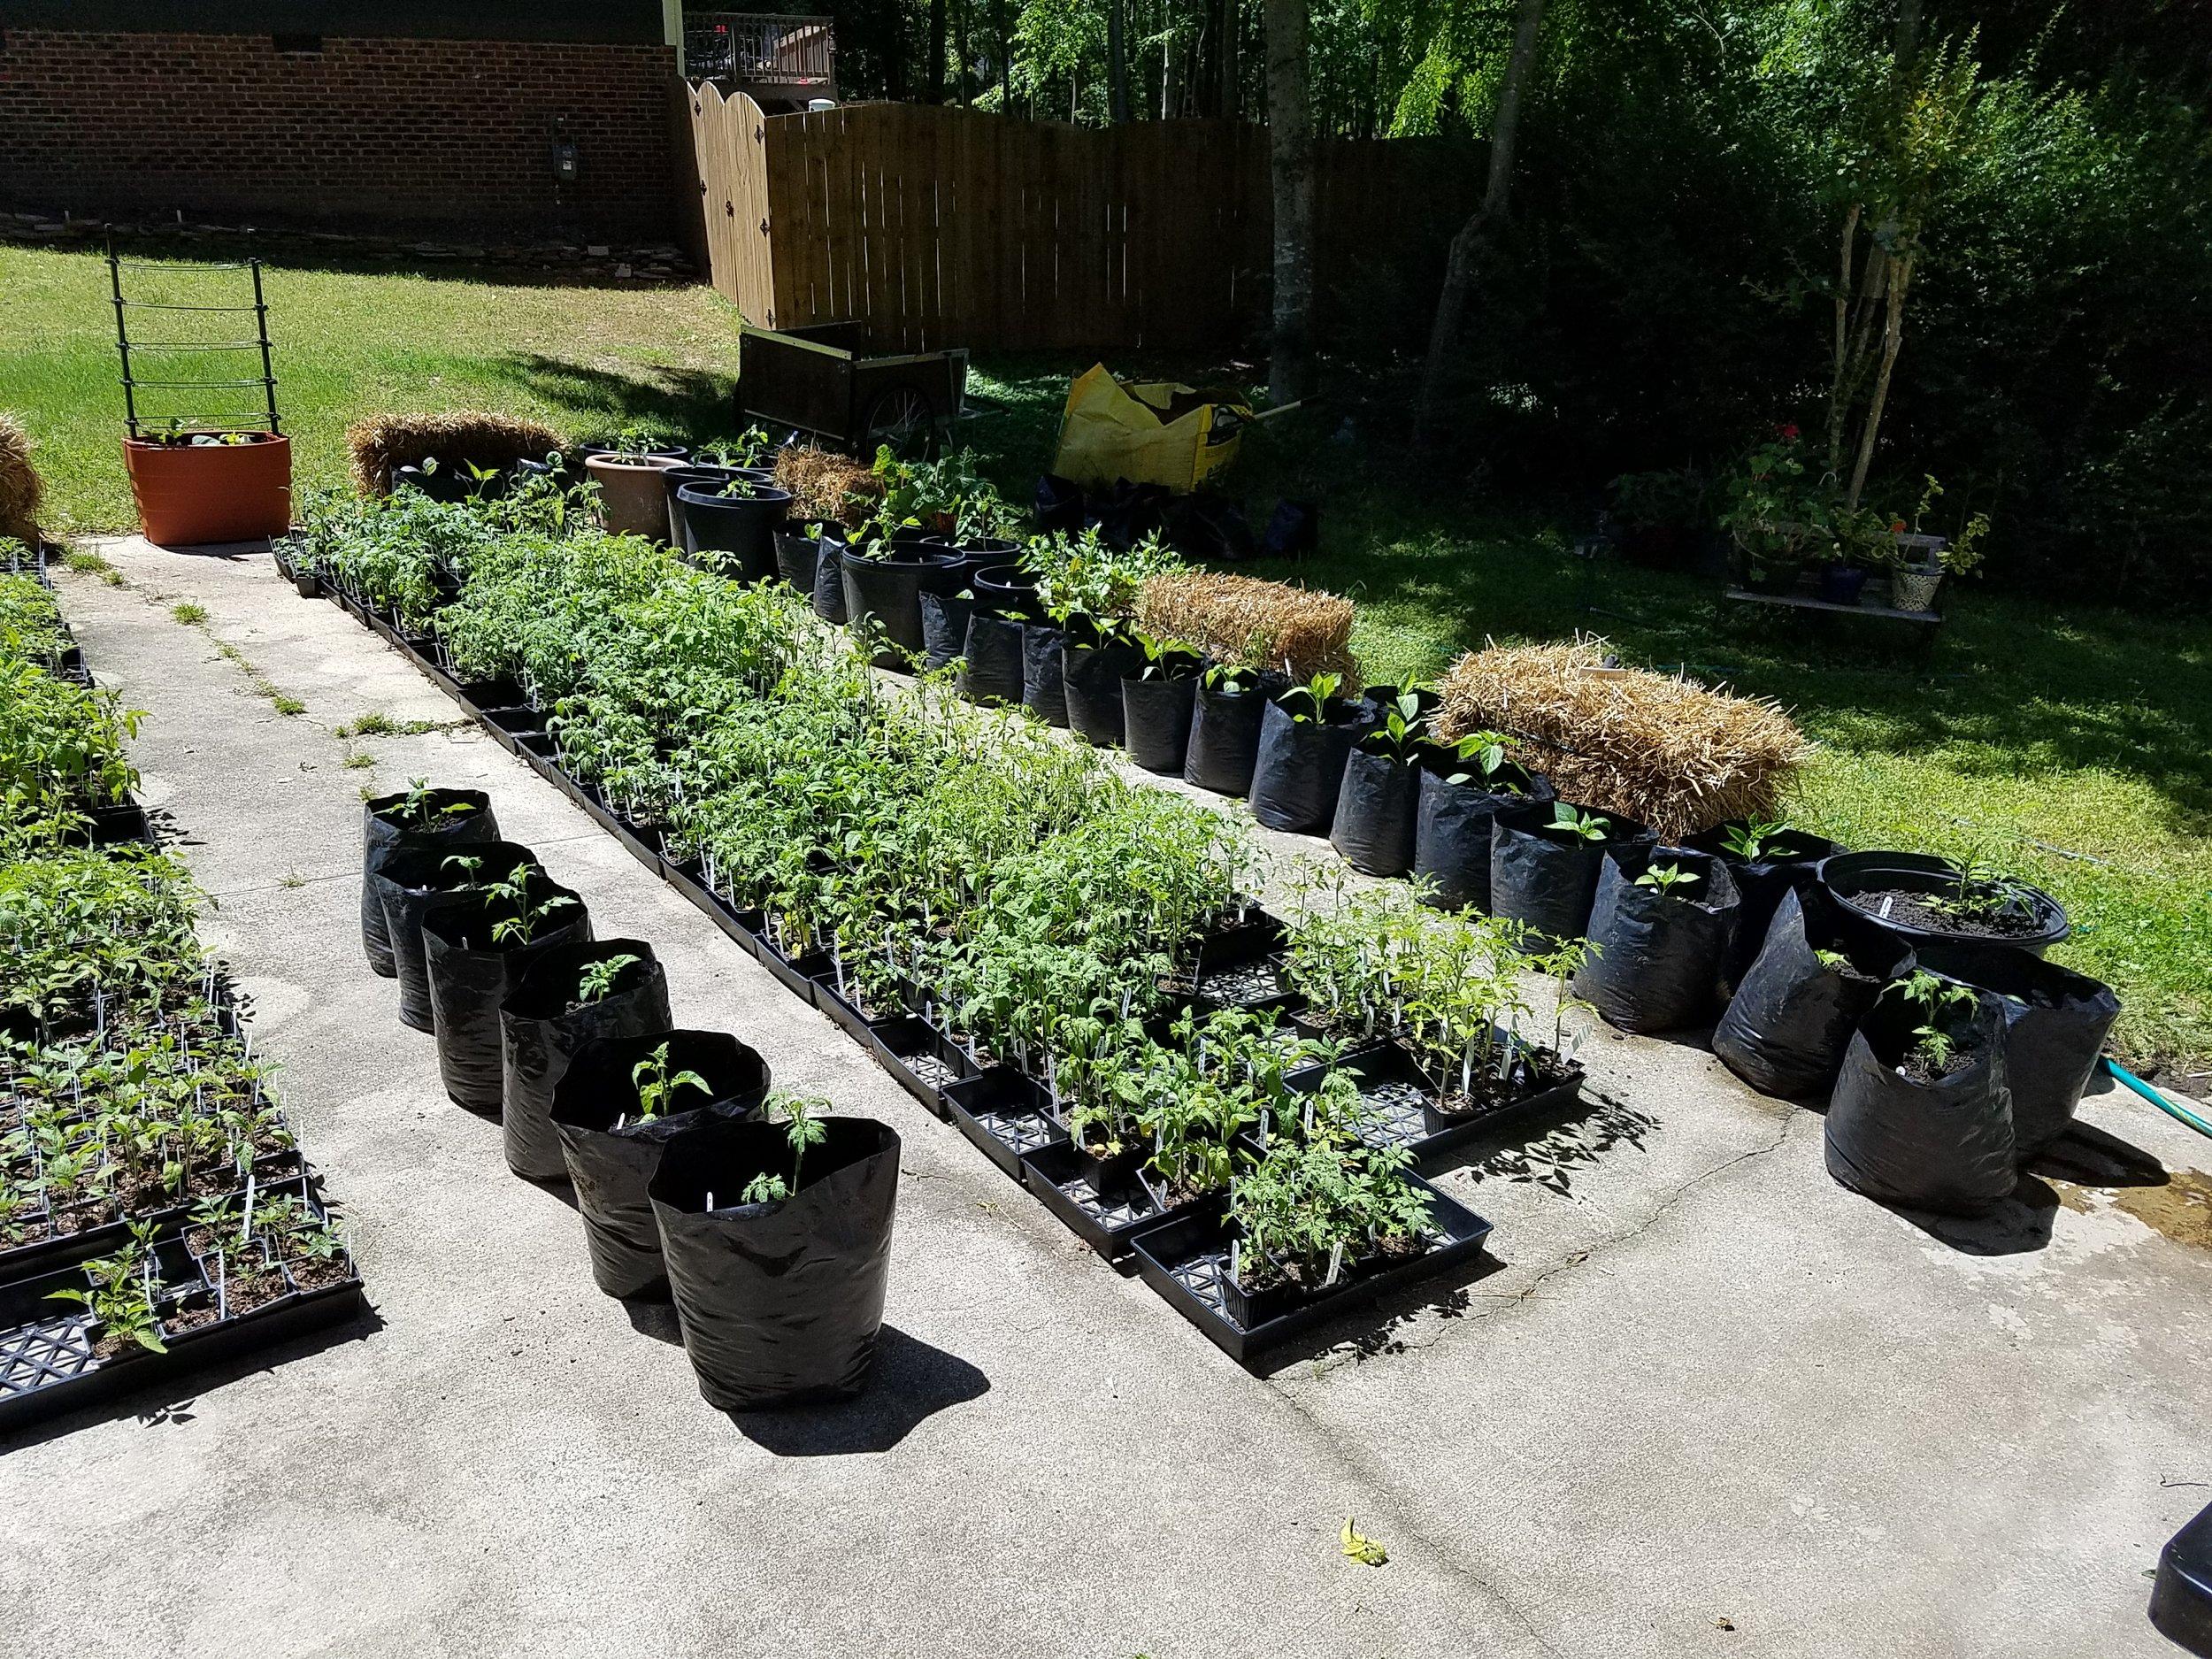 Driveway garden beginning to take shape